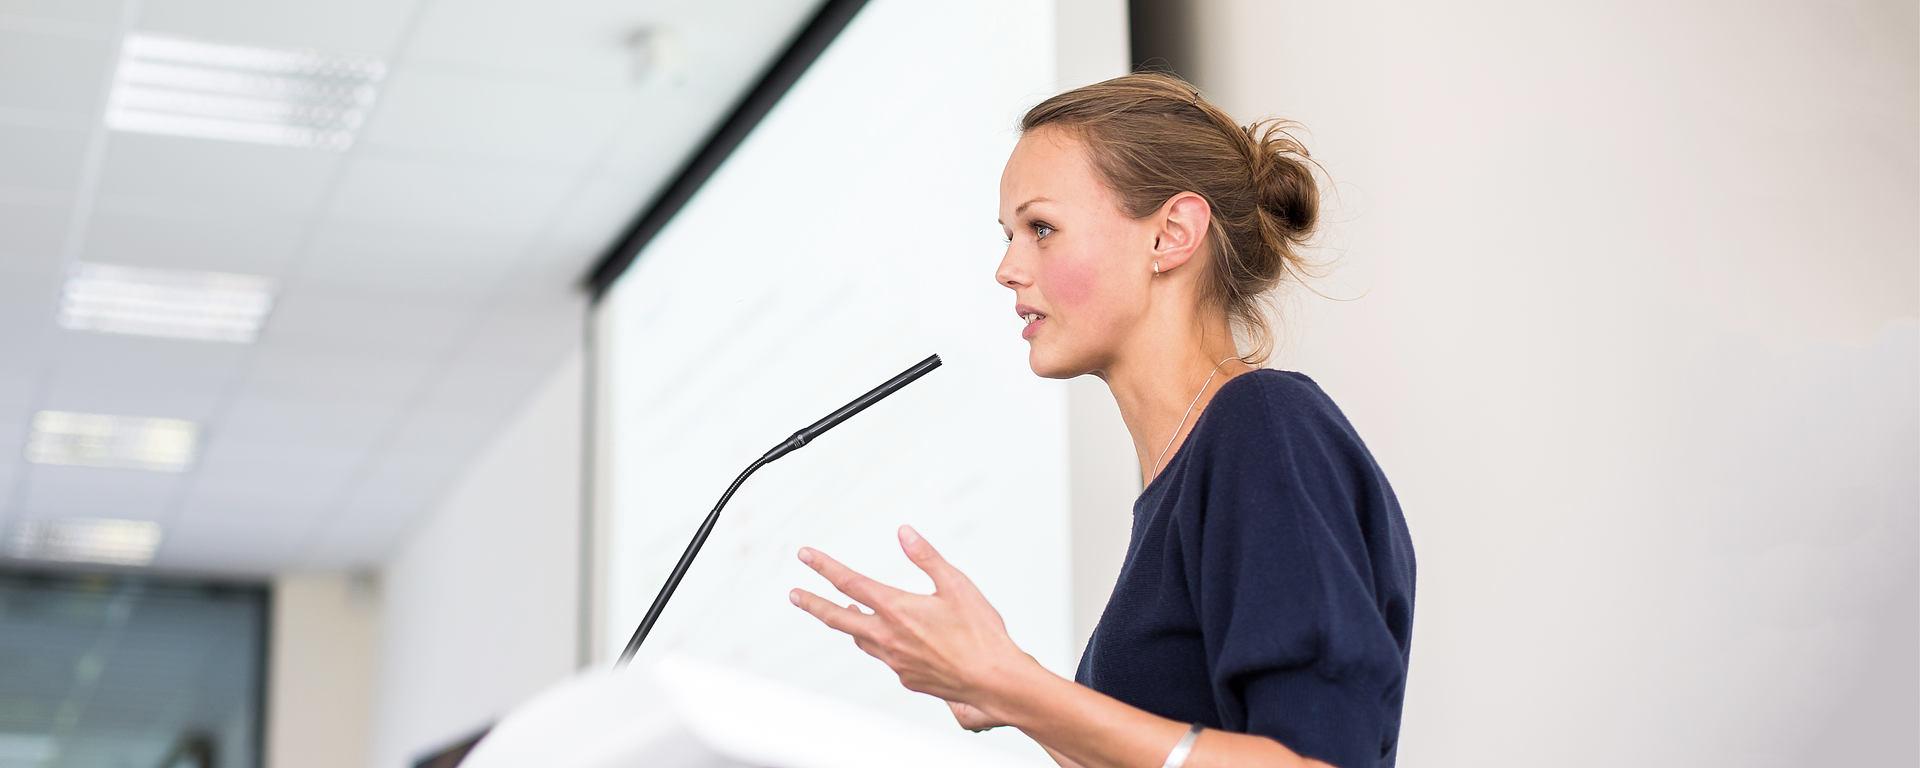 Conference series LEWITT woman podium